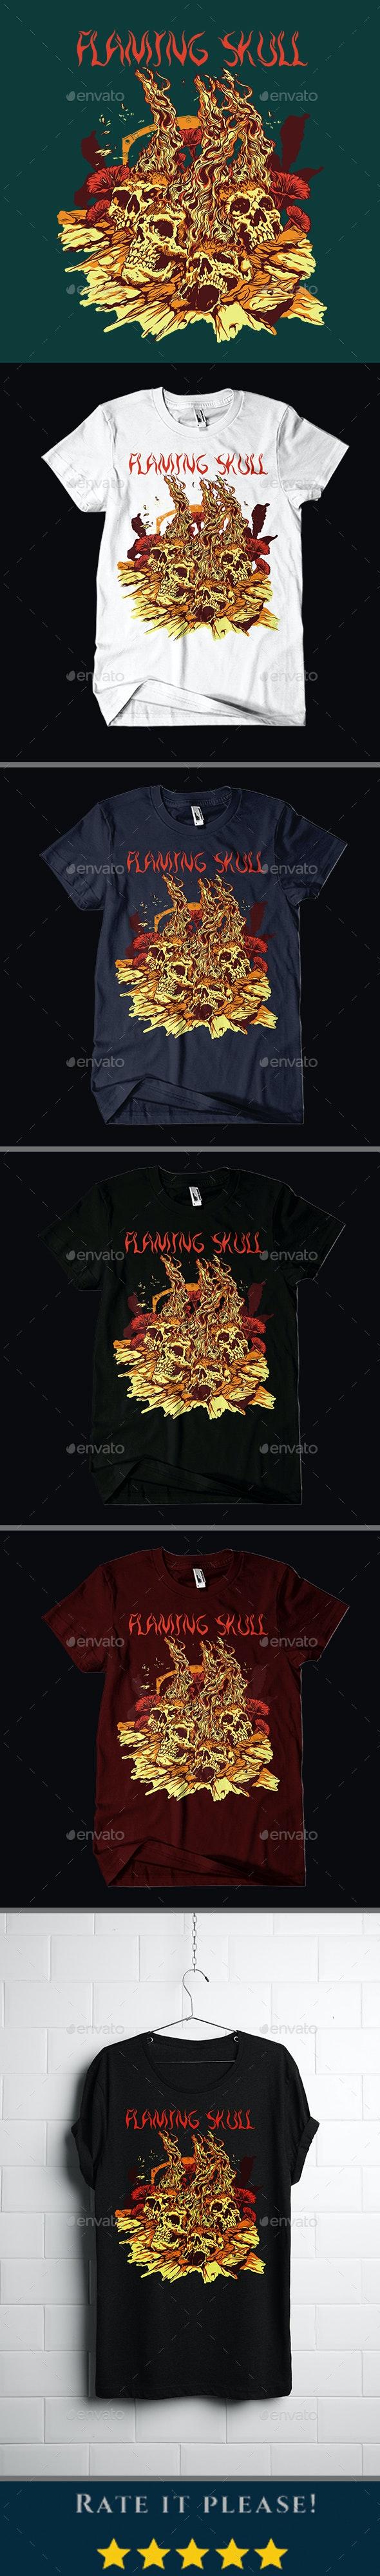 Flaming Skull T-shirt Design - Grunge Designs